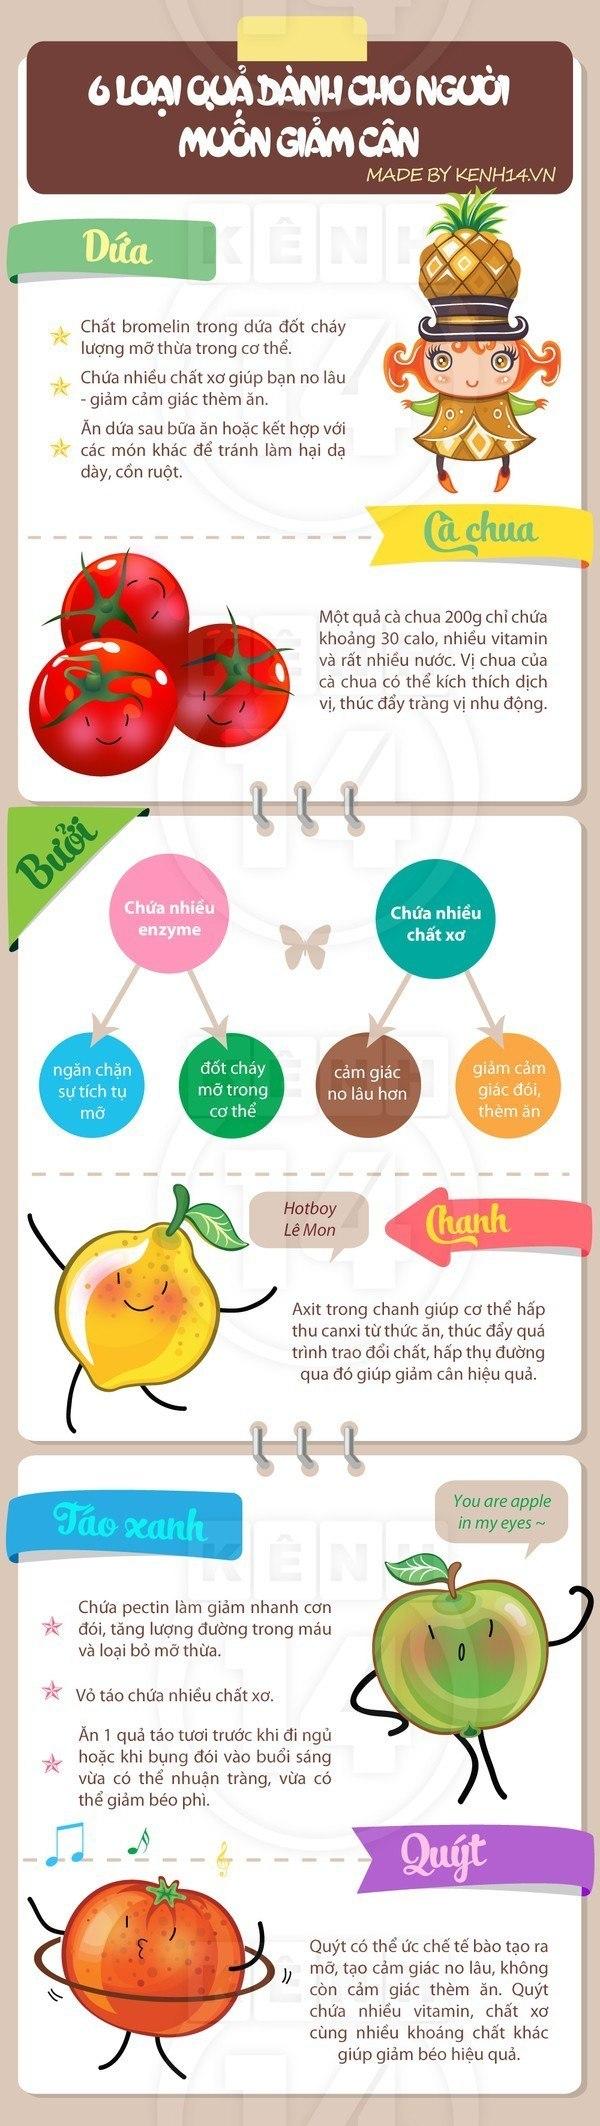 infographic giảm cân